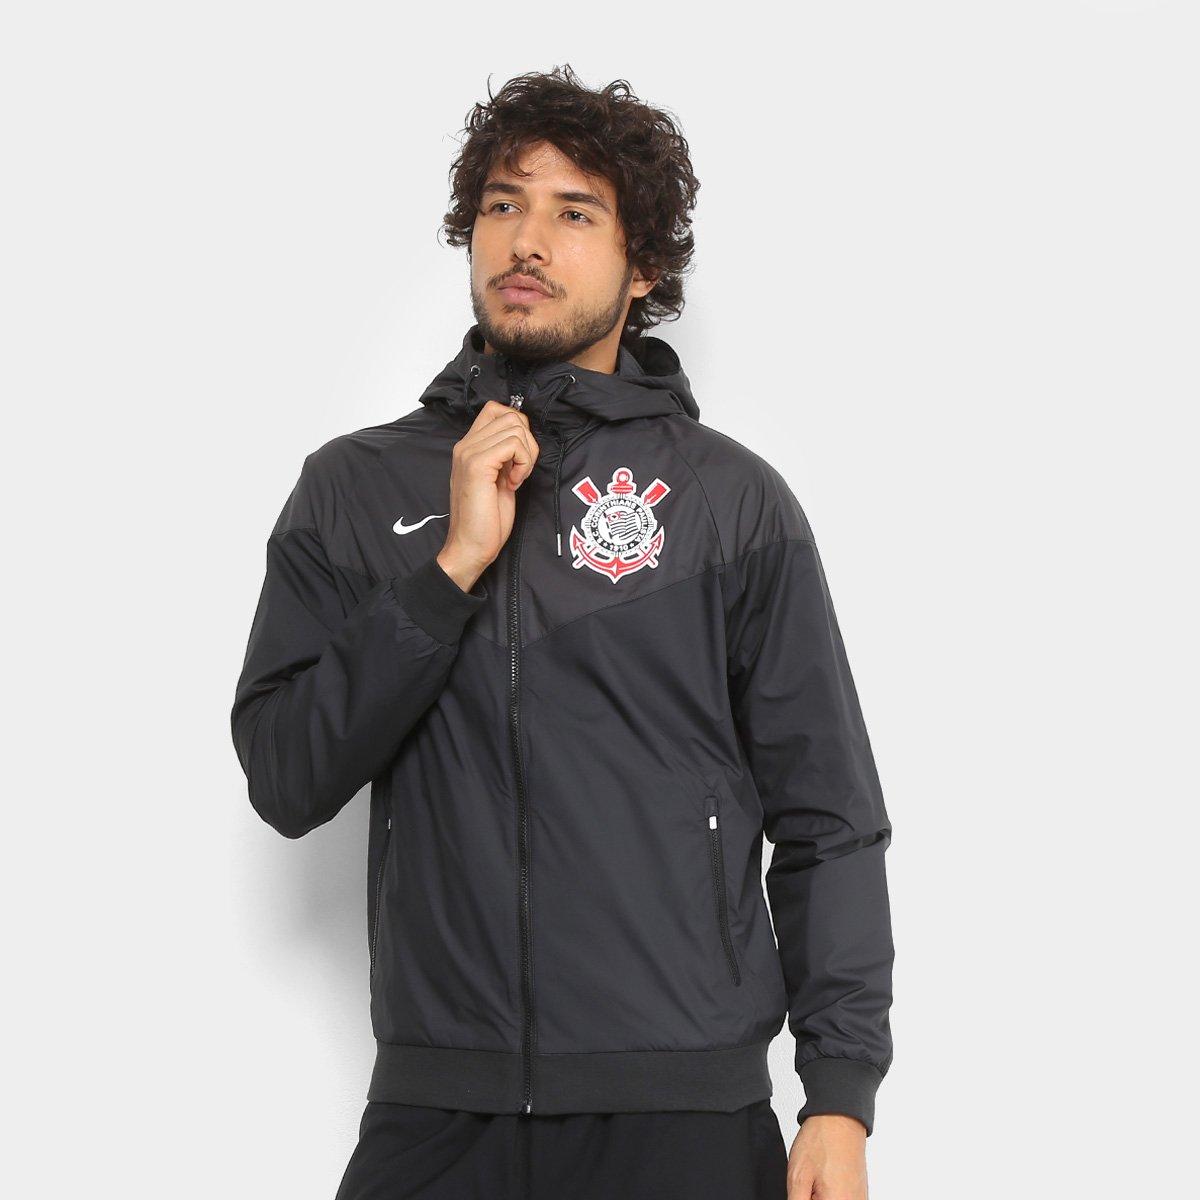 Jaqueta Corinthians Nike Sportwear c  Capuz Masculina - Compre Agora ... 85e3f76484fee